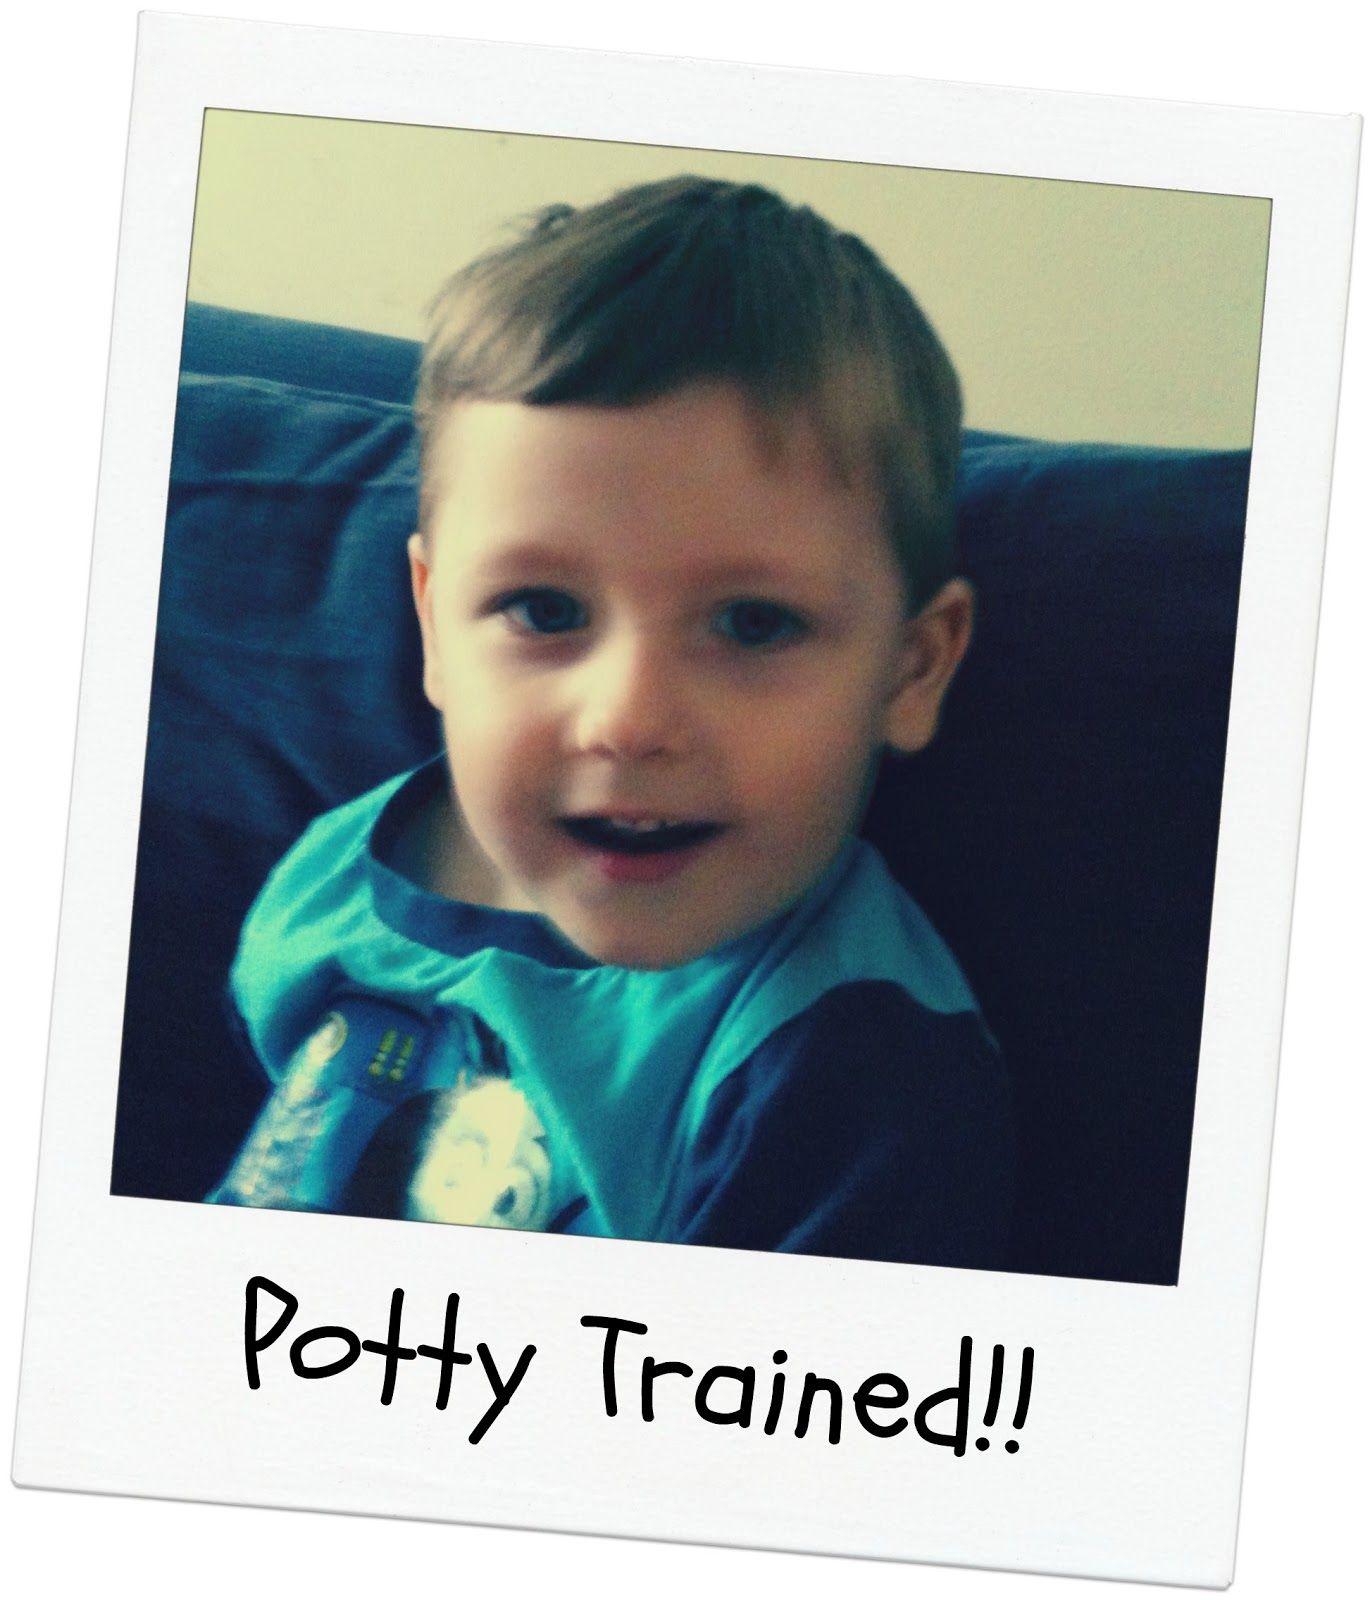 how to potty train my baby